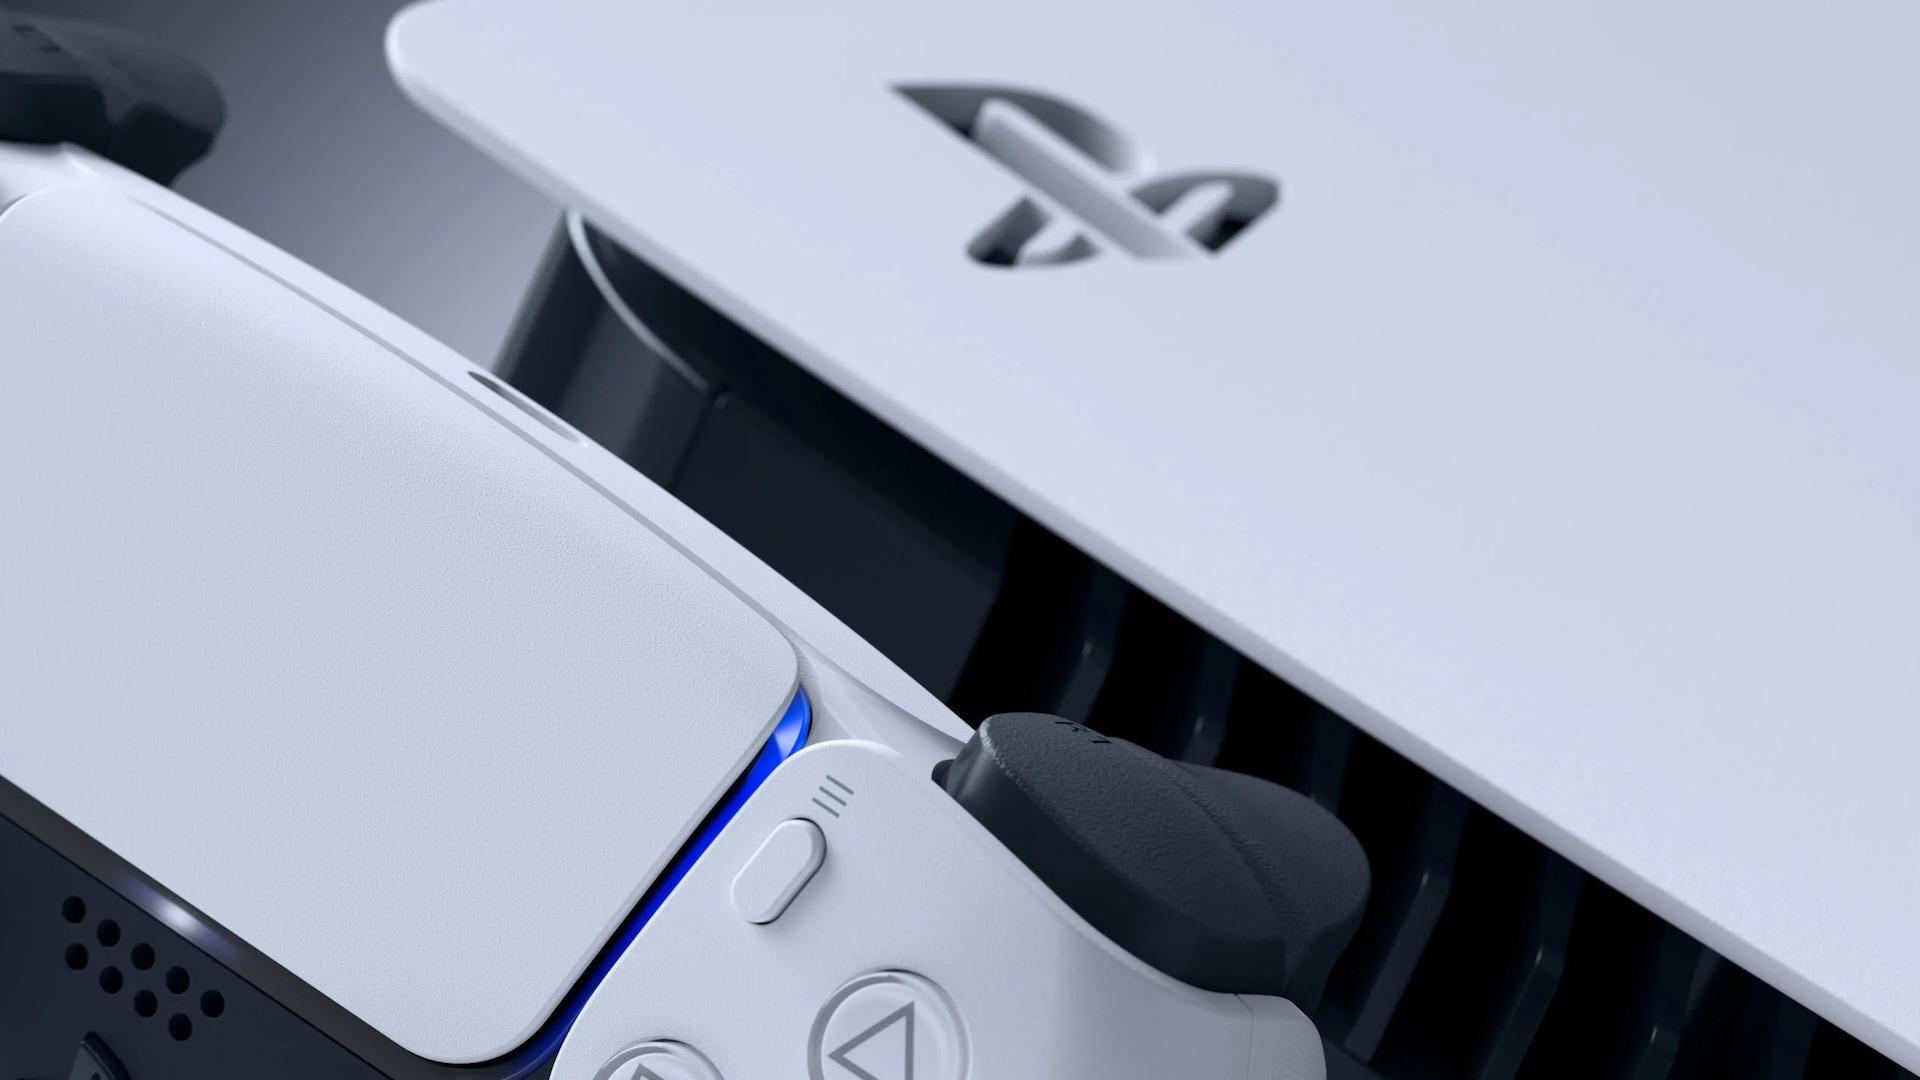 Dettaglio PlayStation 5 PS5 recensione